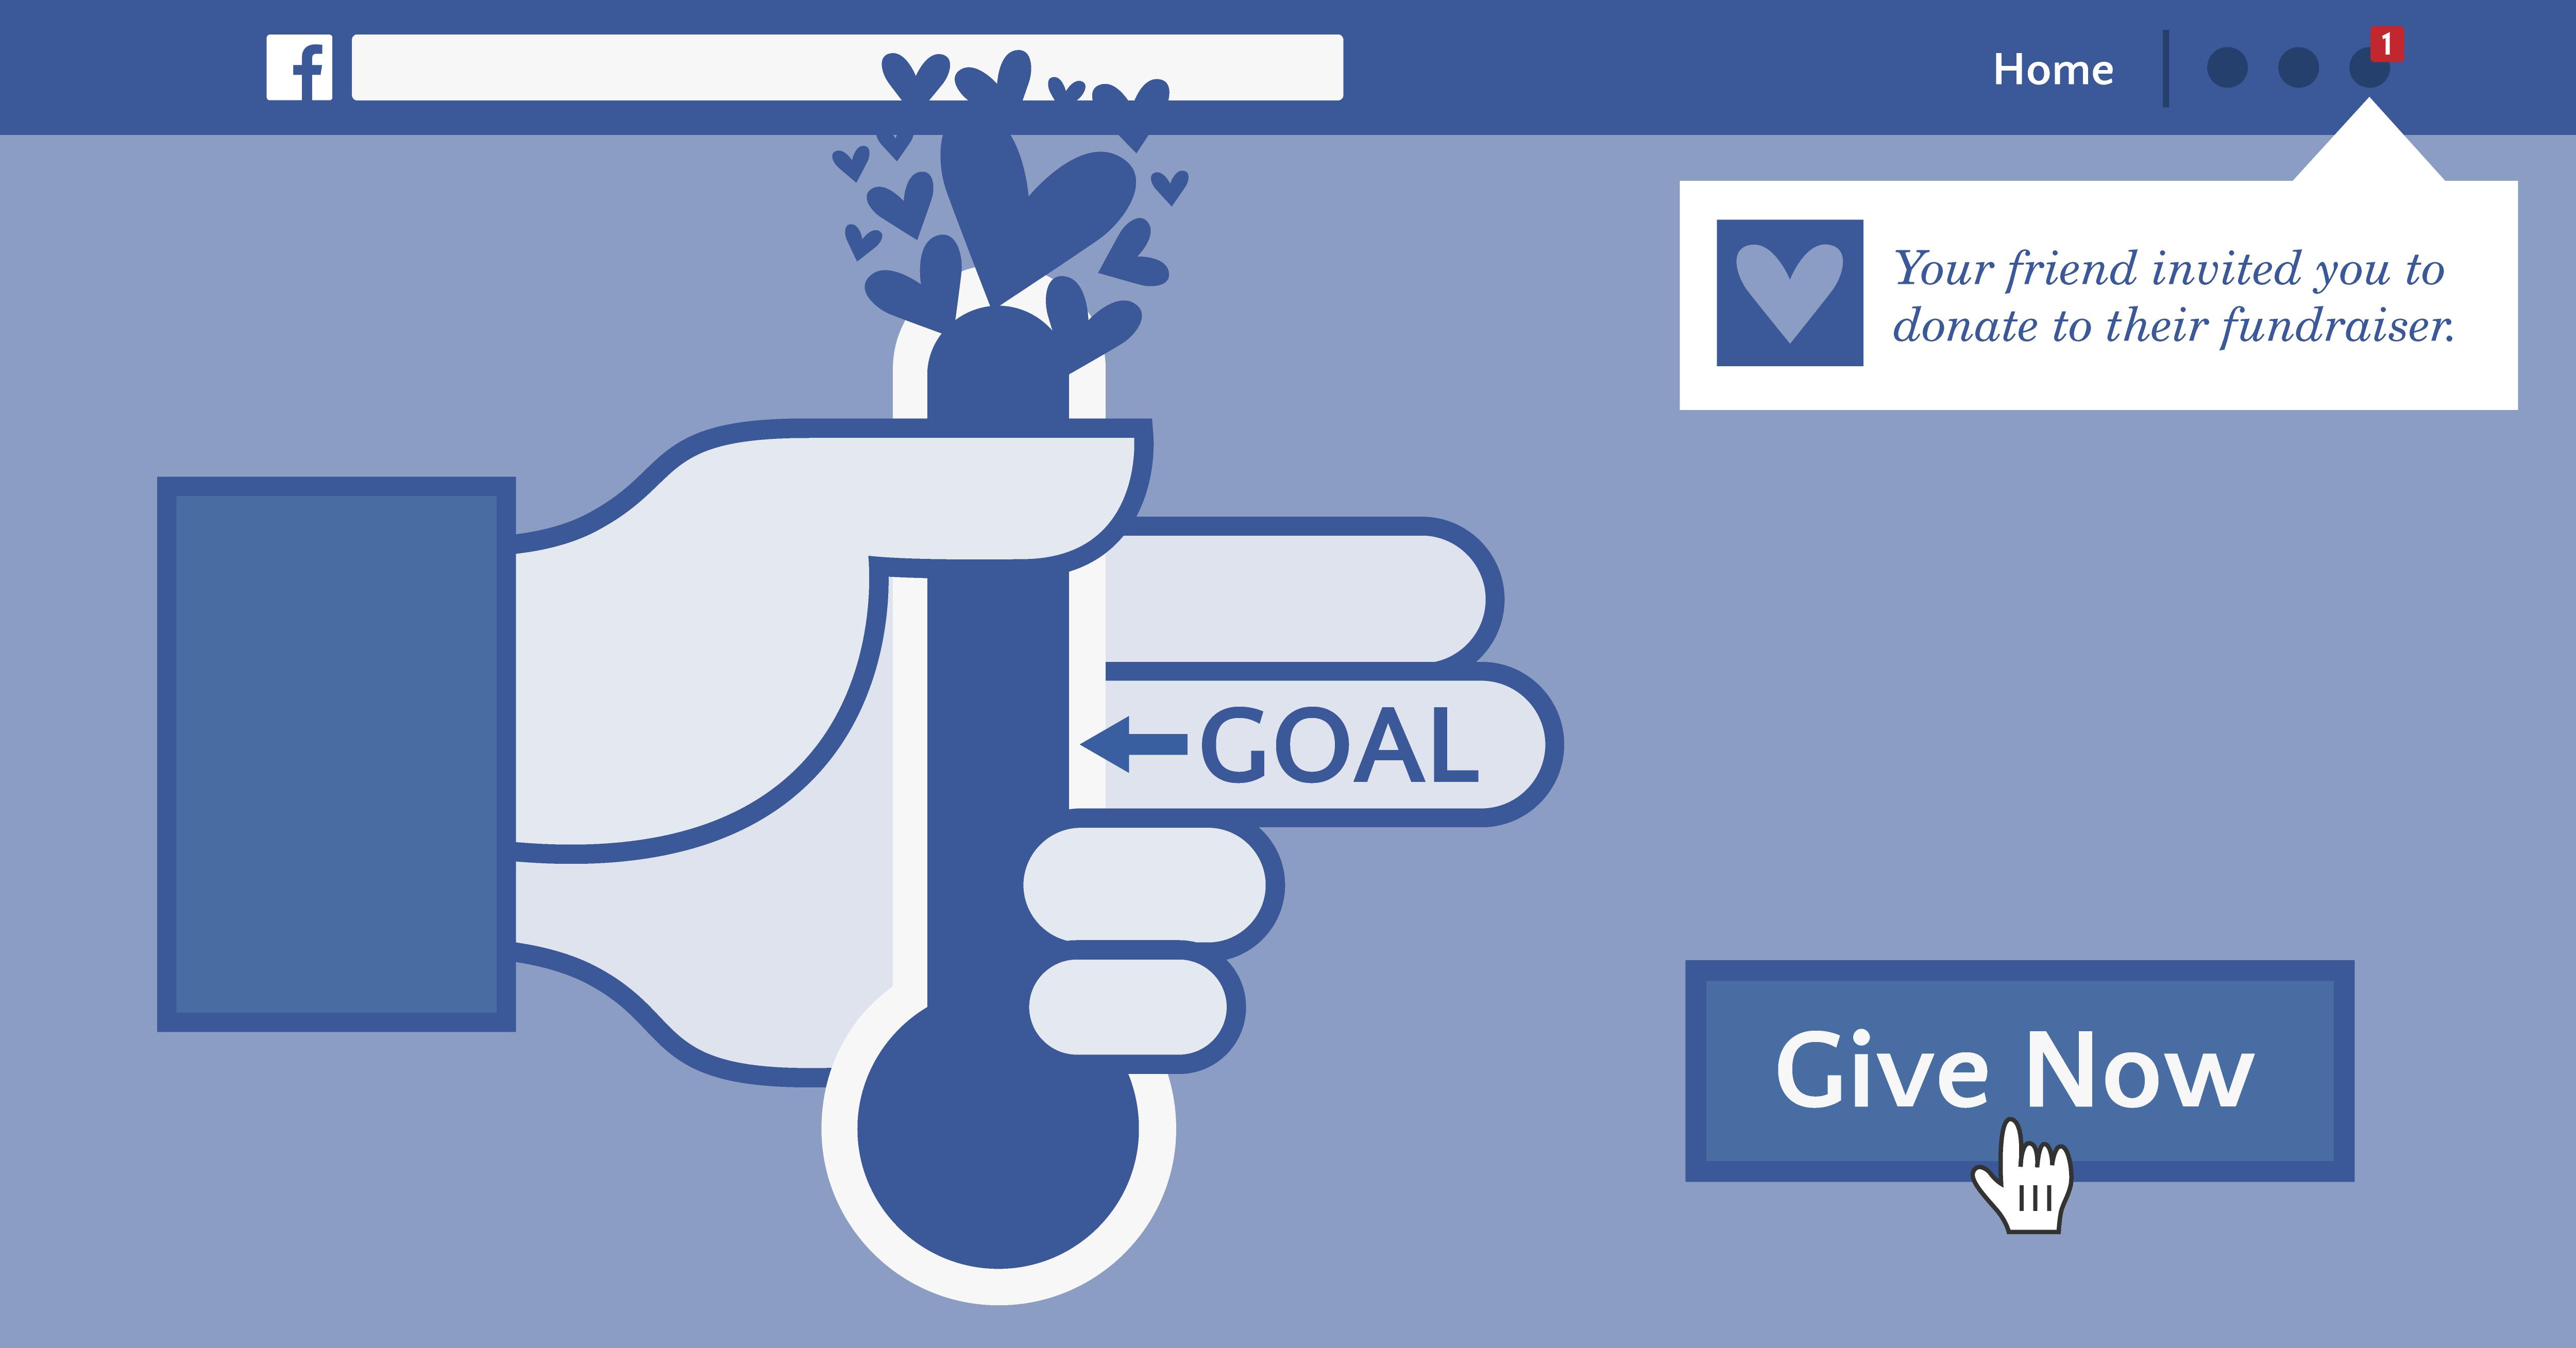 Blog_FB_Fundraising-01.png